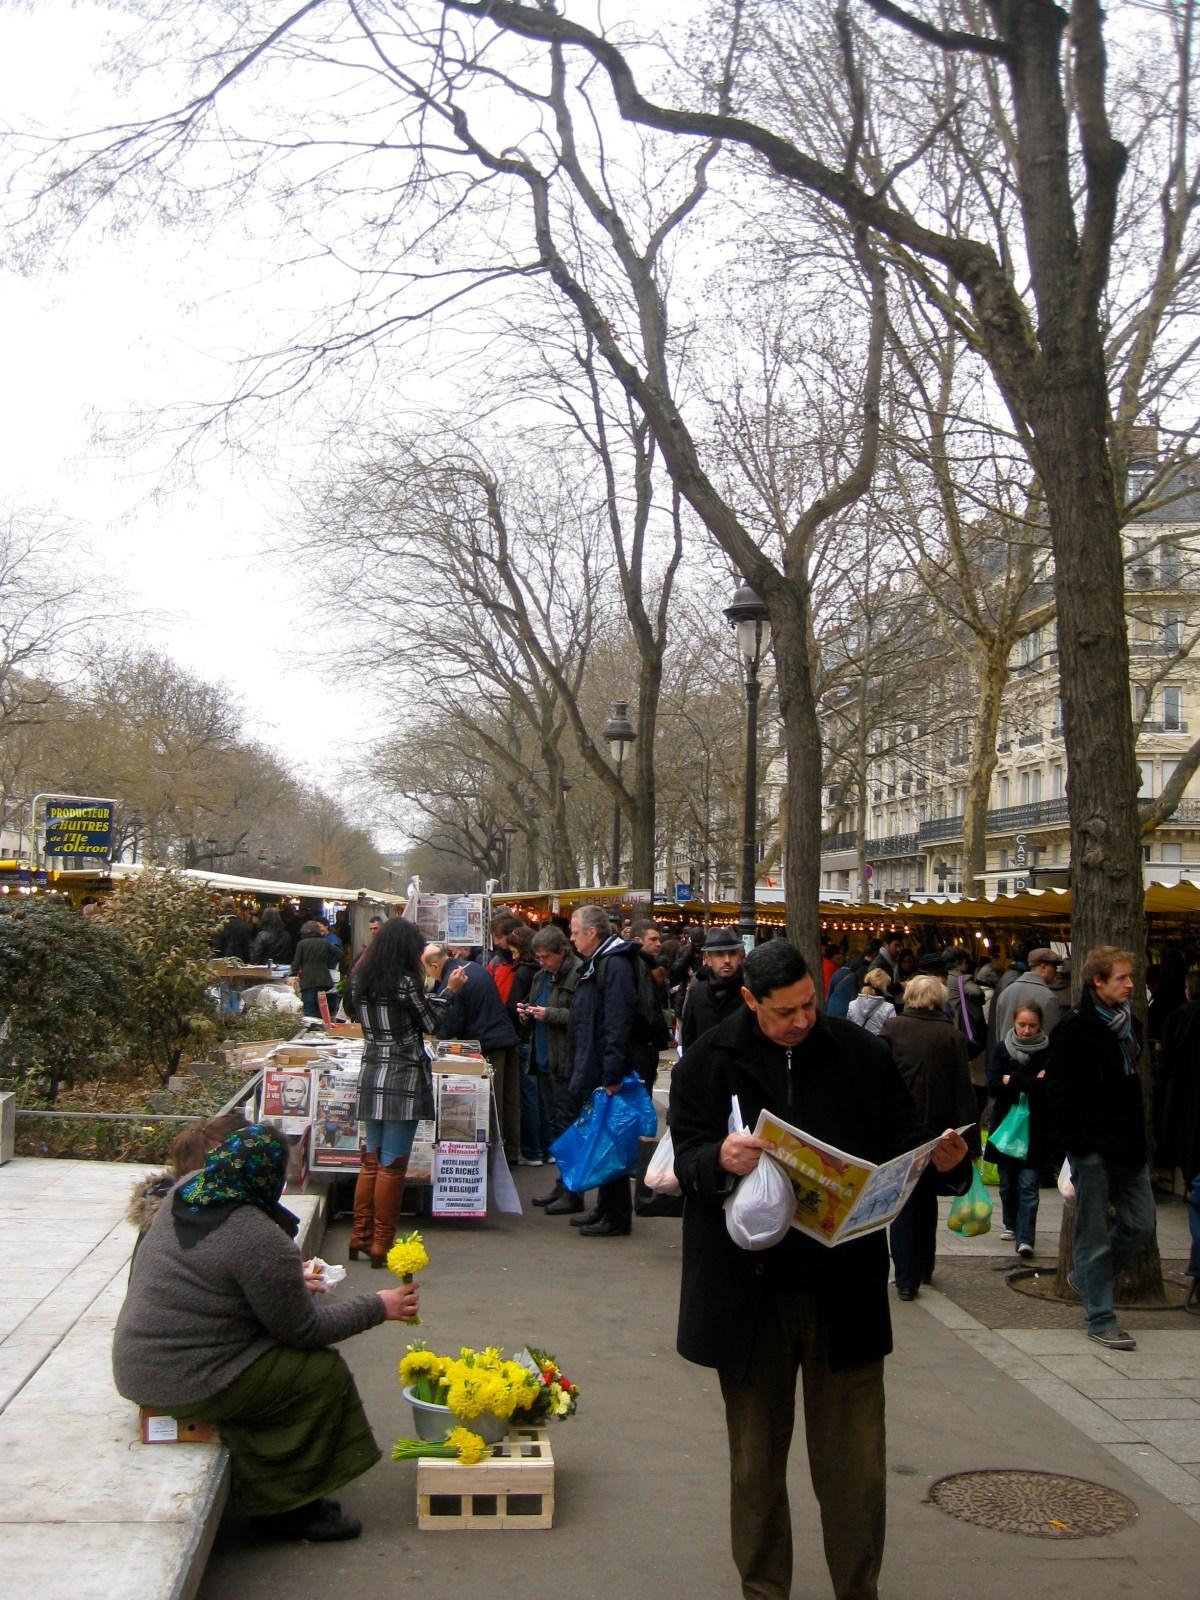 Marche Bastille market in Paris, France in winter